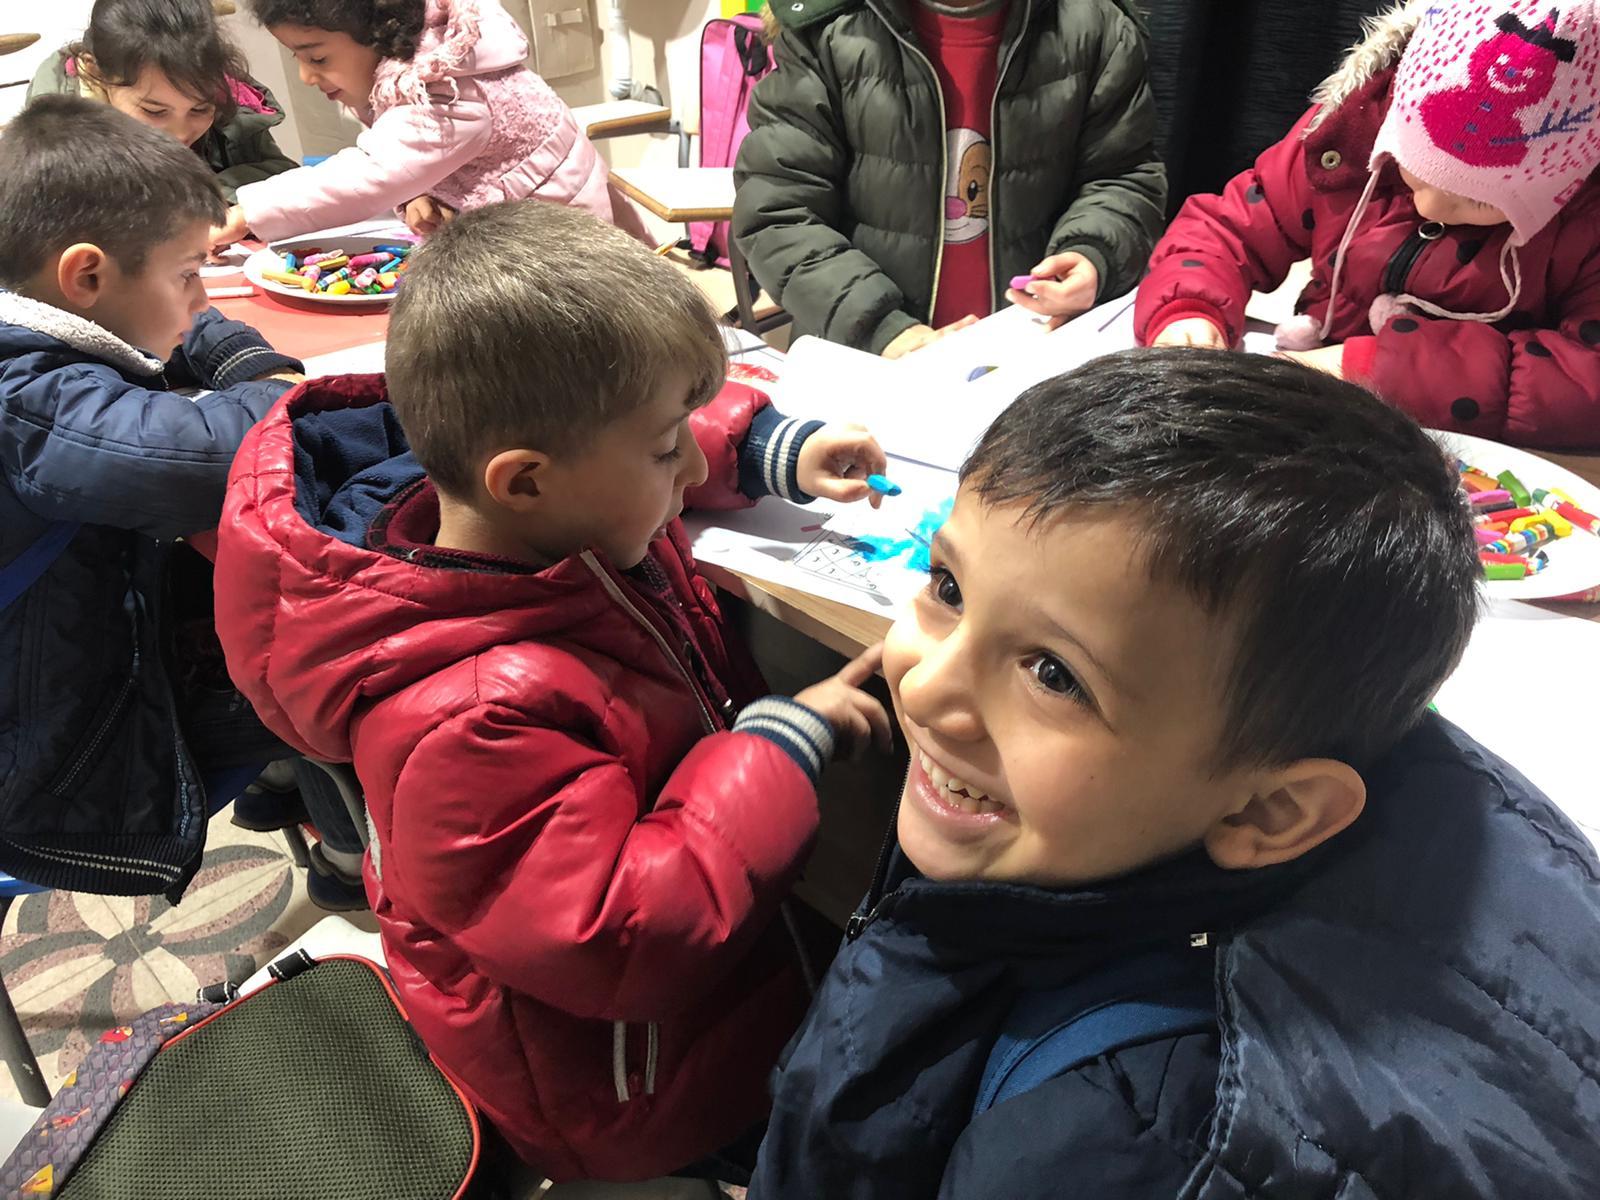 Boy smiling in class